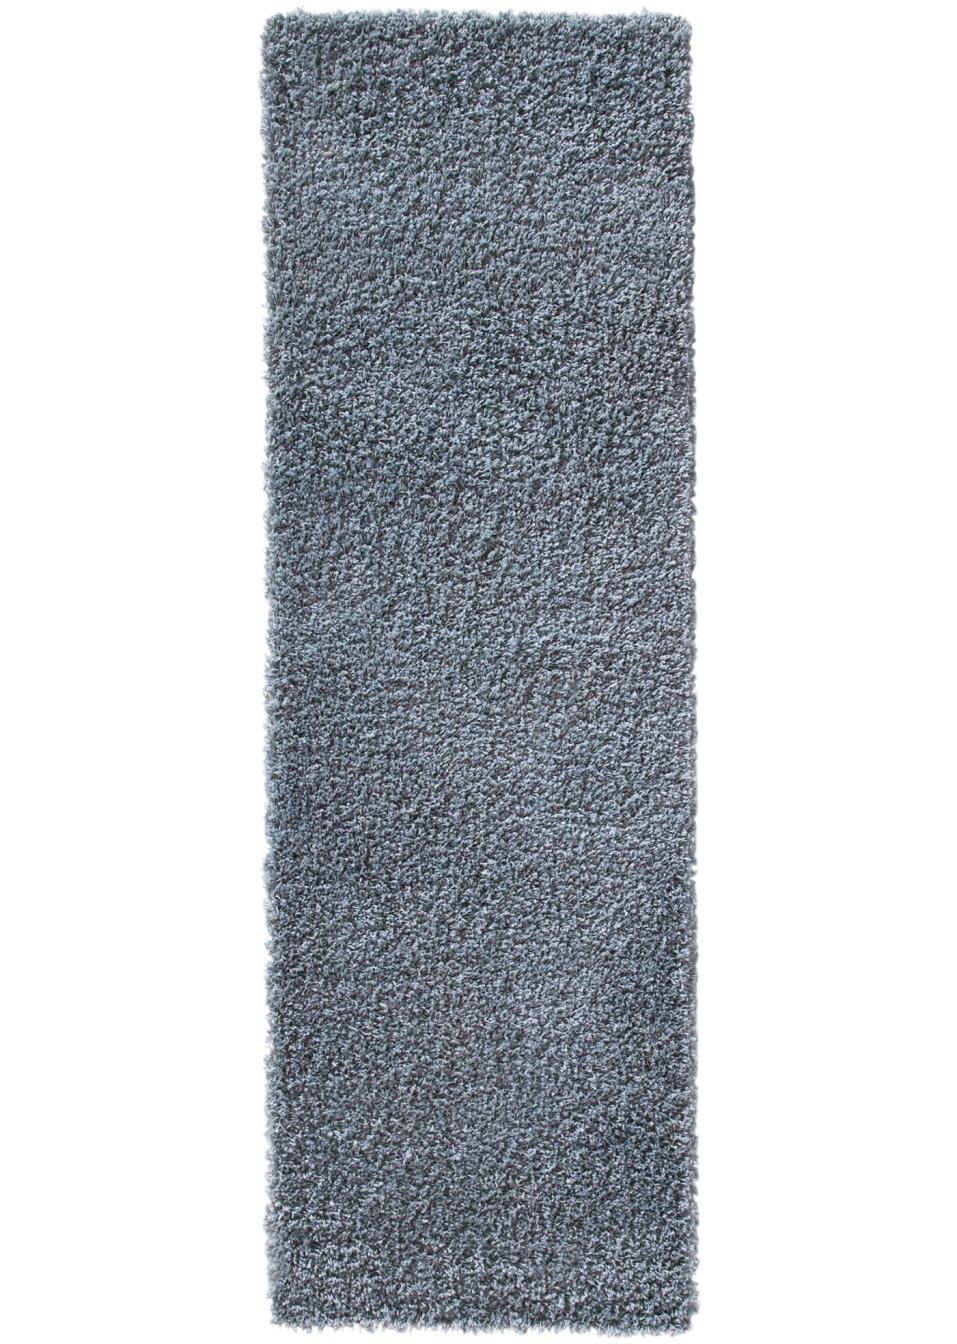 tapis de passage toronto bleu glacier bpc living acheter online. Black Bedroom Furniture Sets. Home Design Ideas